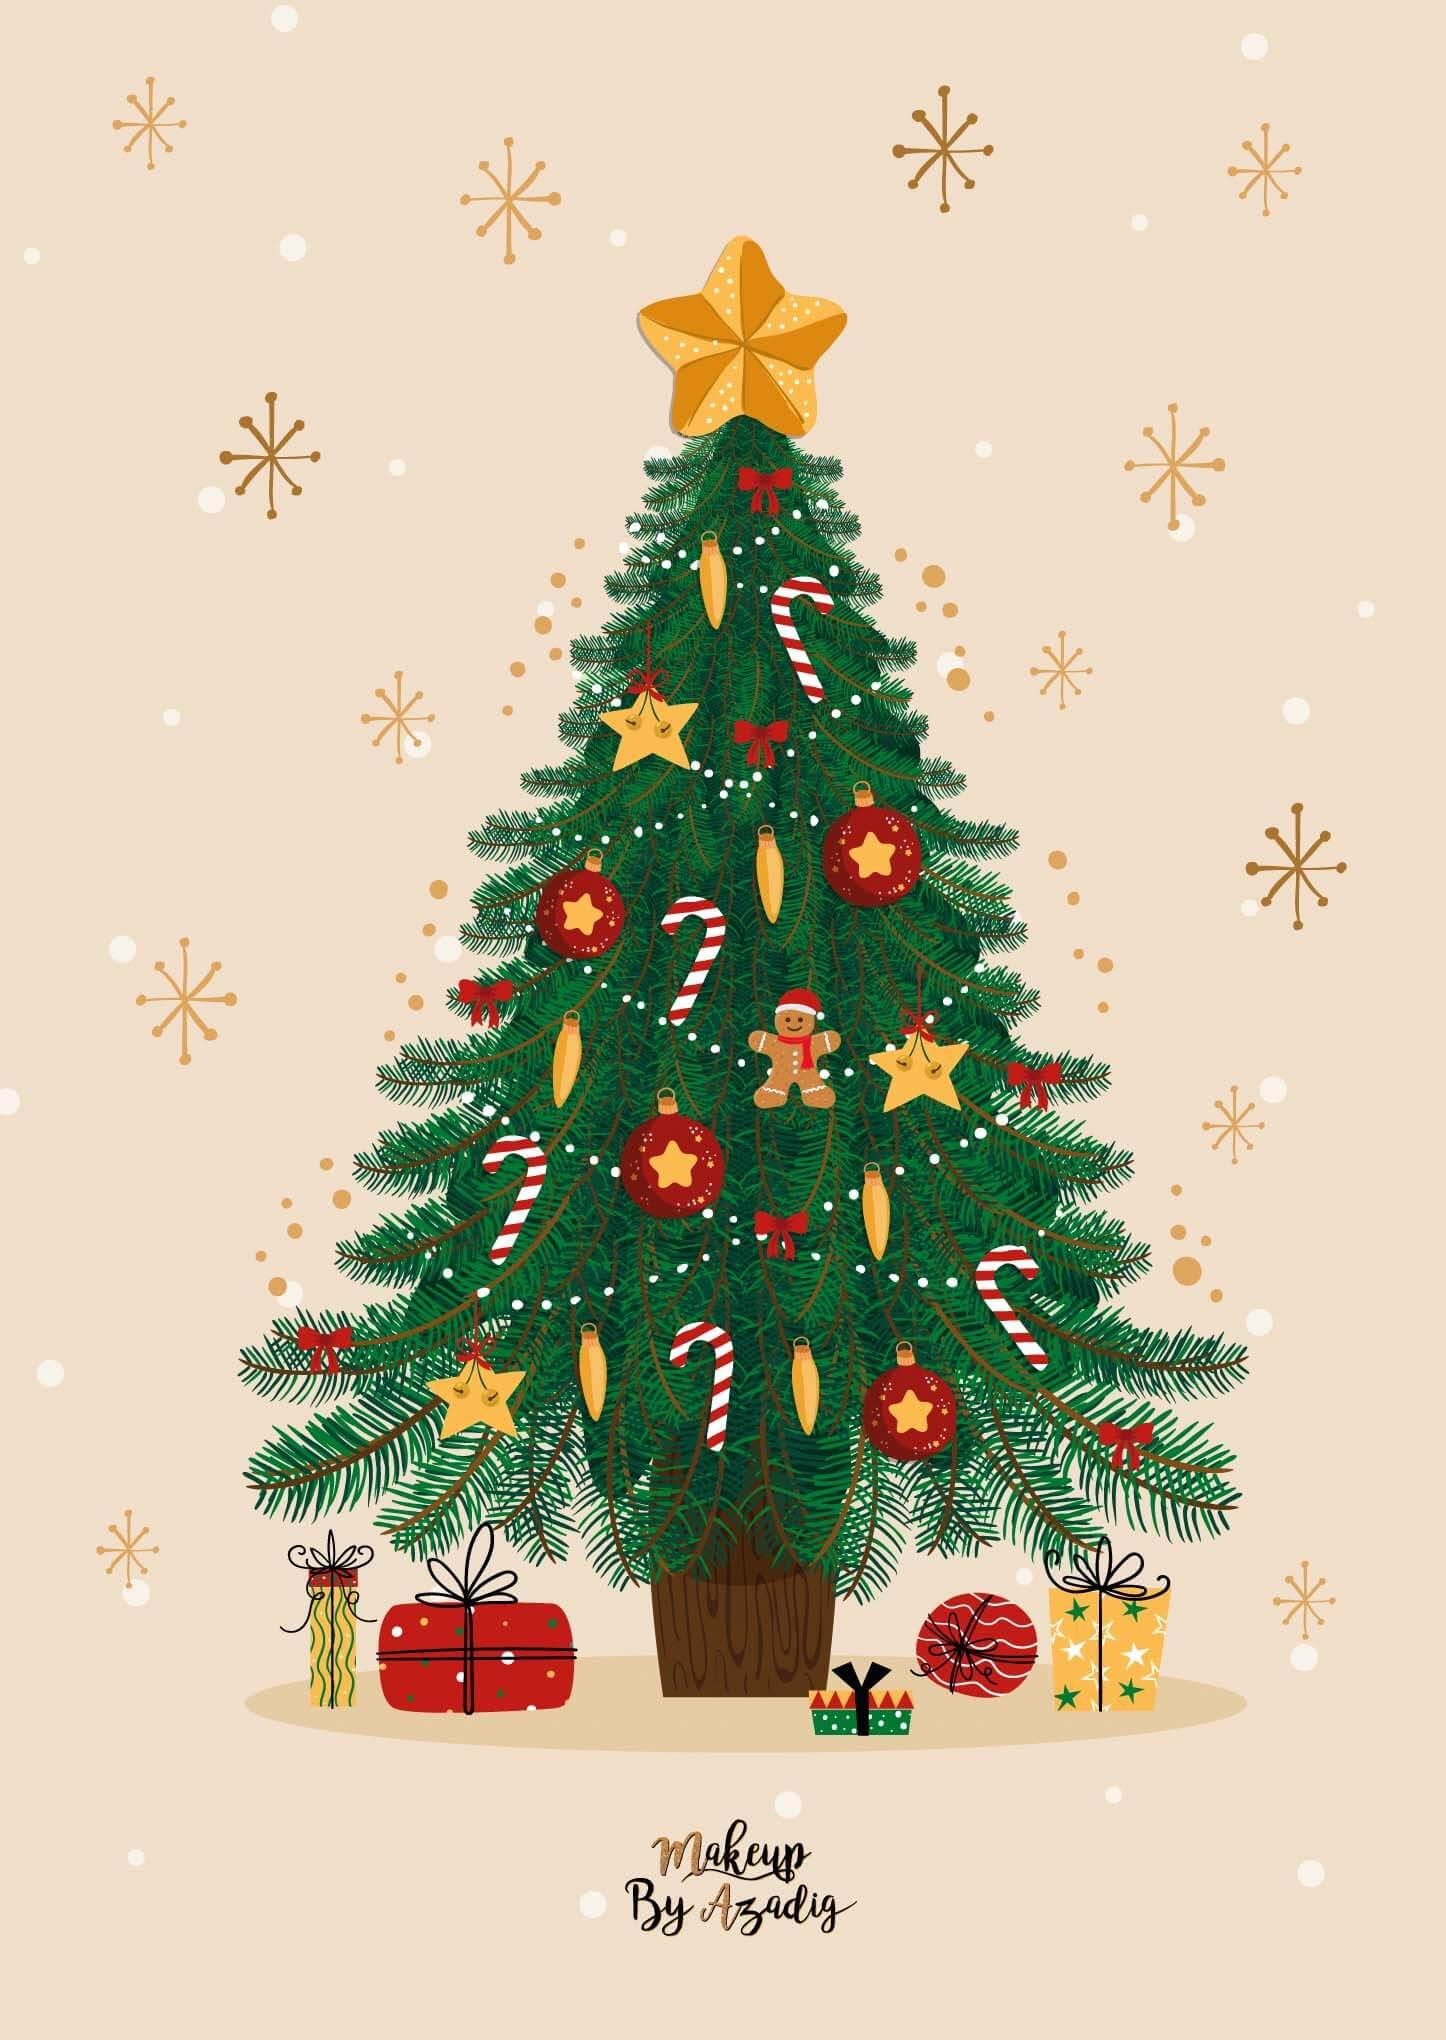 fond-decran-wallpaper-christmas-noel-tree-christmastree-ipad-tablette-apple-makeupbyazadig-tendance